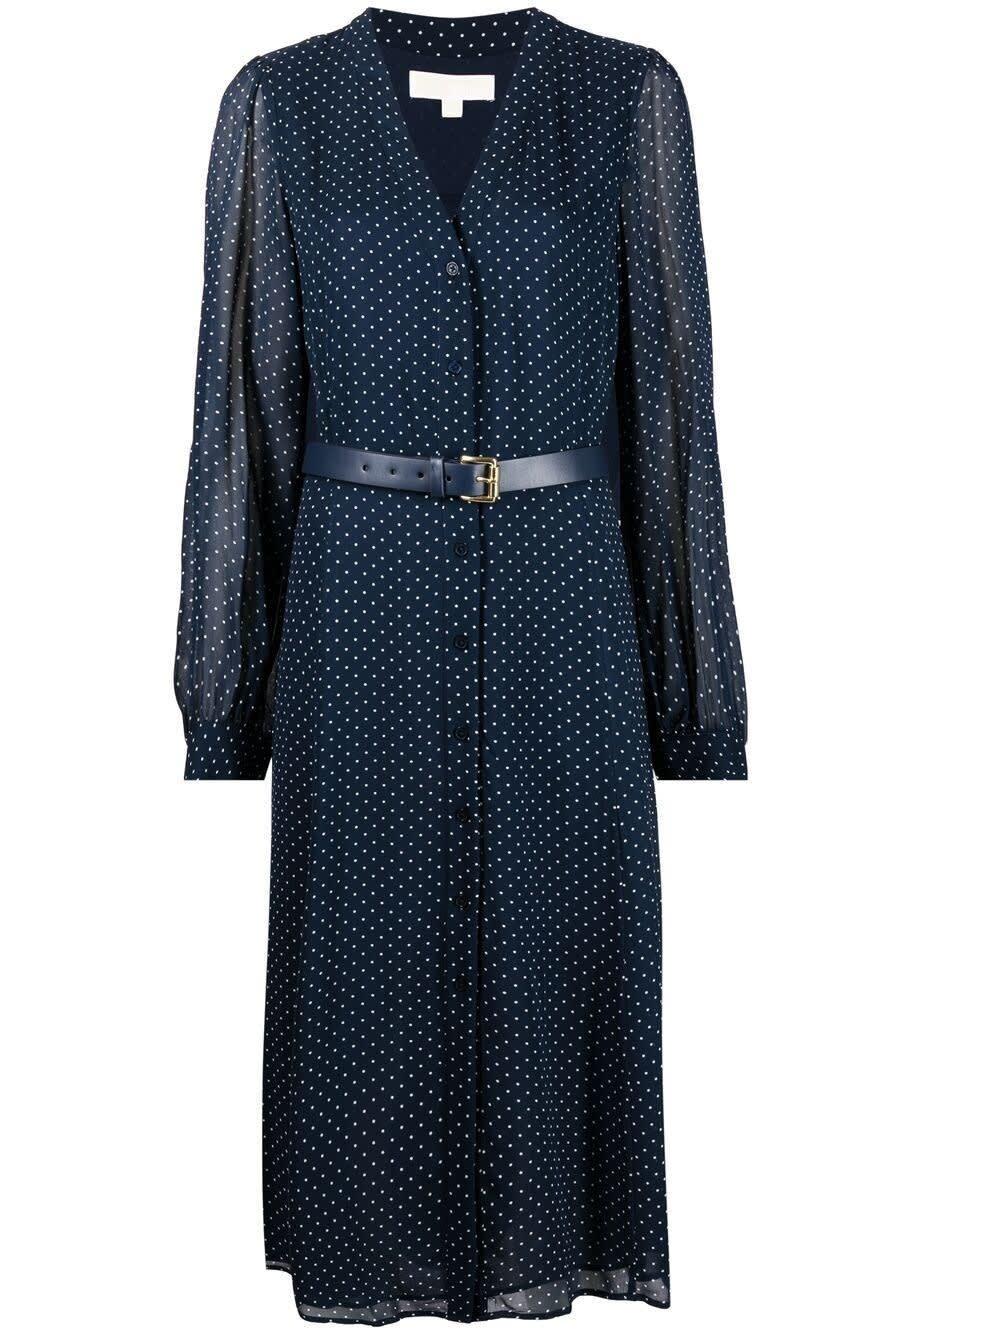 Michael Michael Kors Clothing BLUE POLKA DOT VISCOSE DRESS